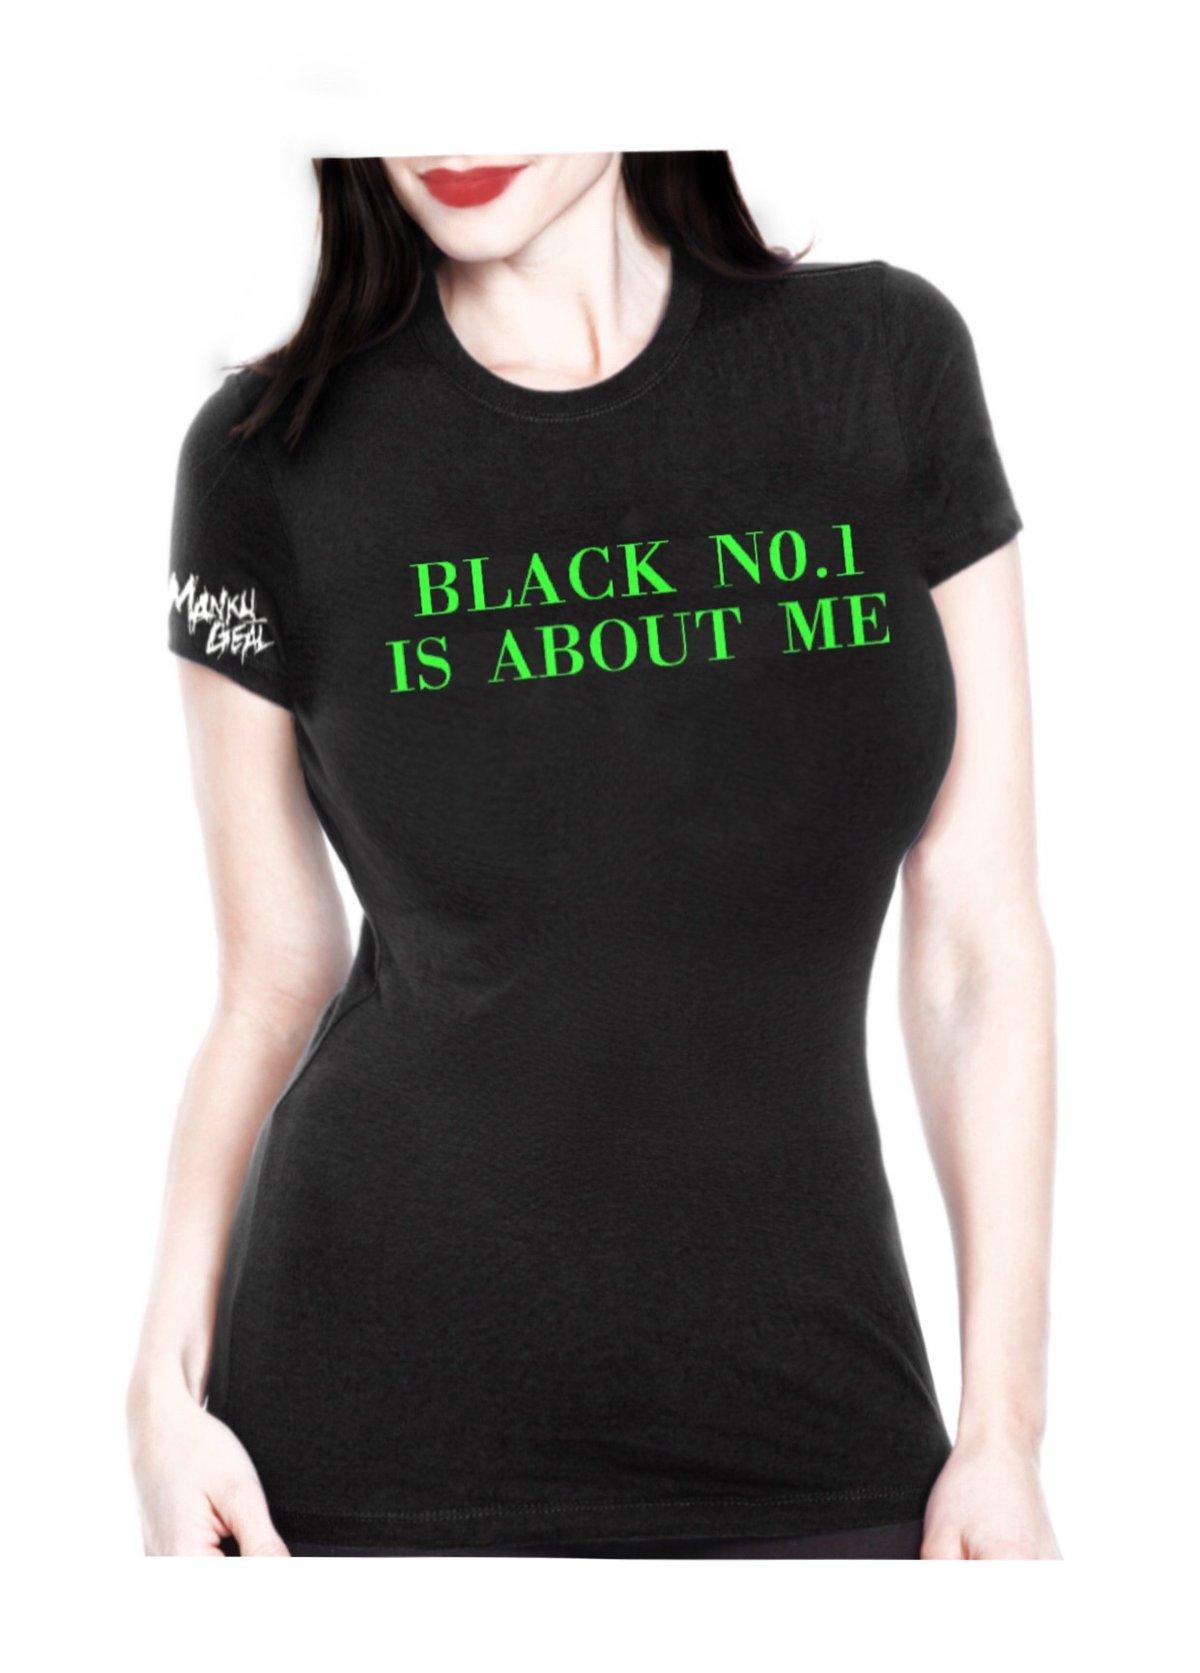 Image of Black No.1 Green Women's Tee